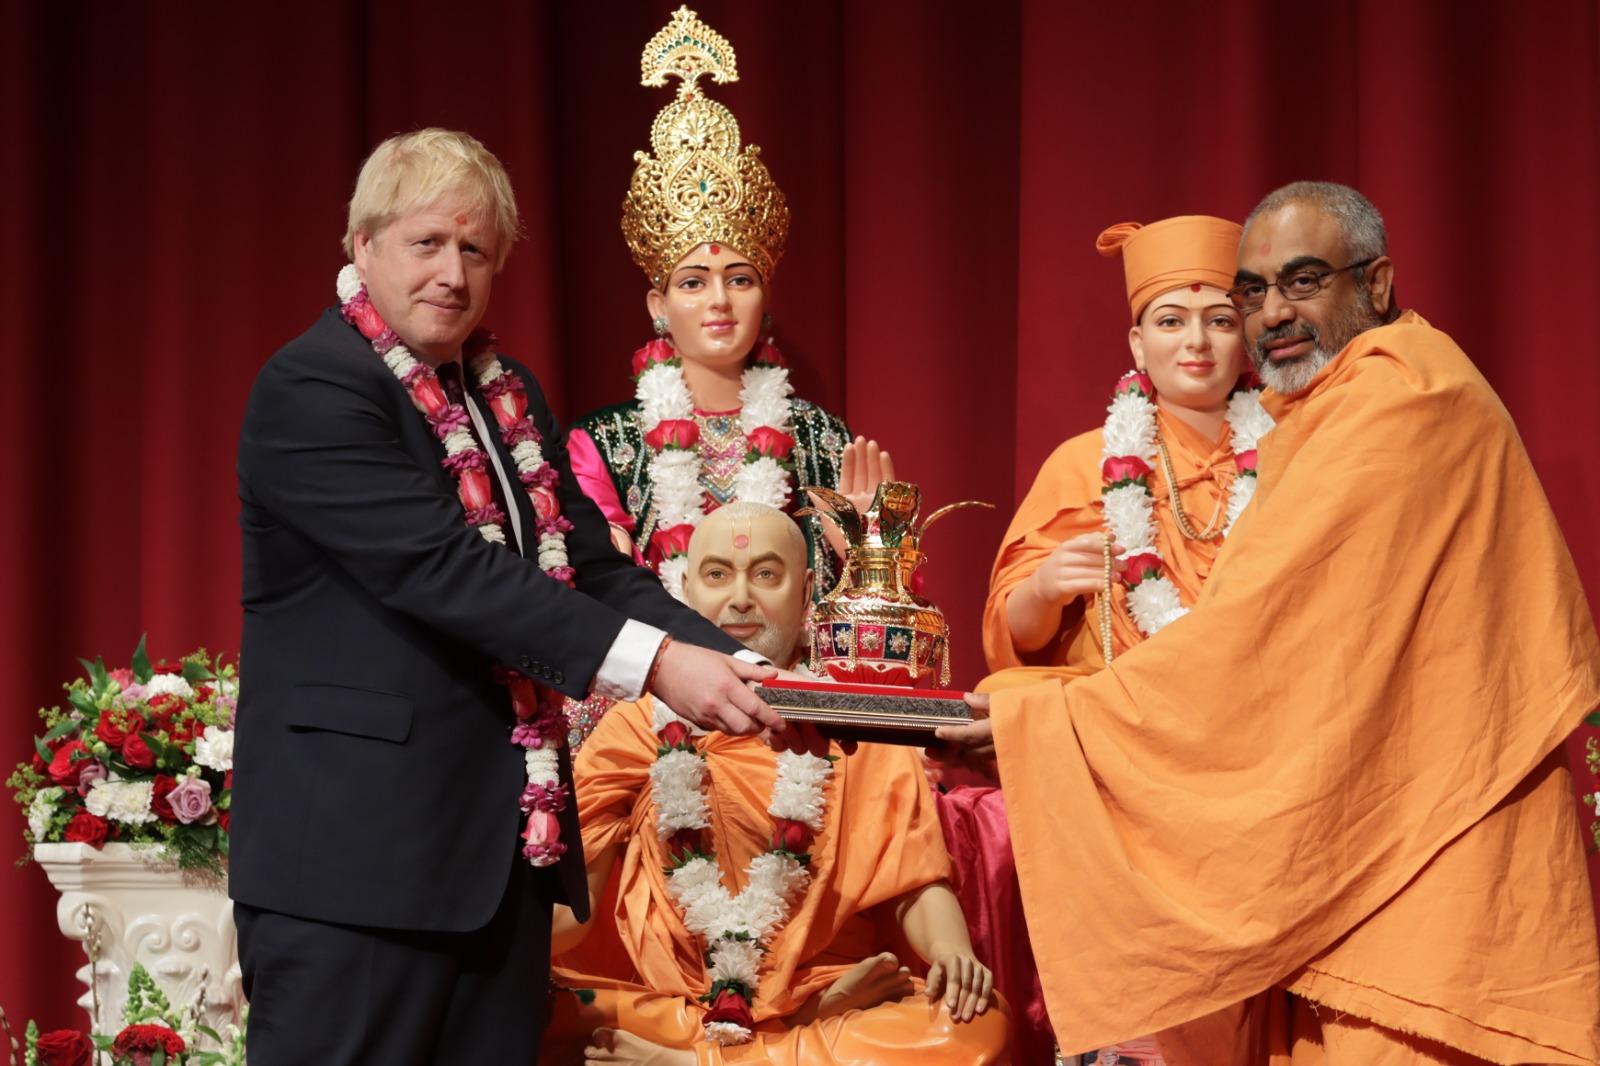 COMMUNITY SPIRIT: Boris Johnson at the BAPS Neasden Temple last weekend